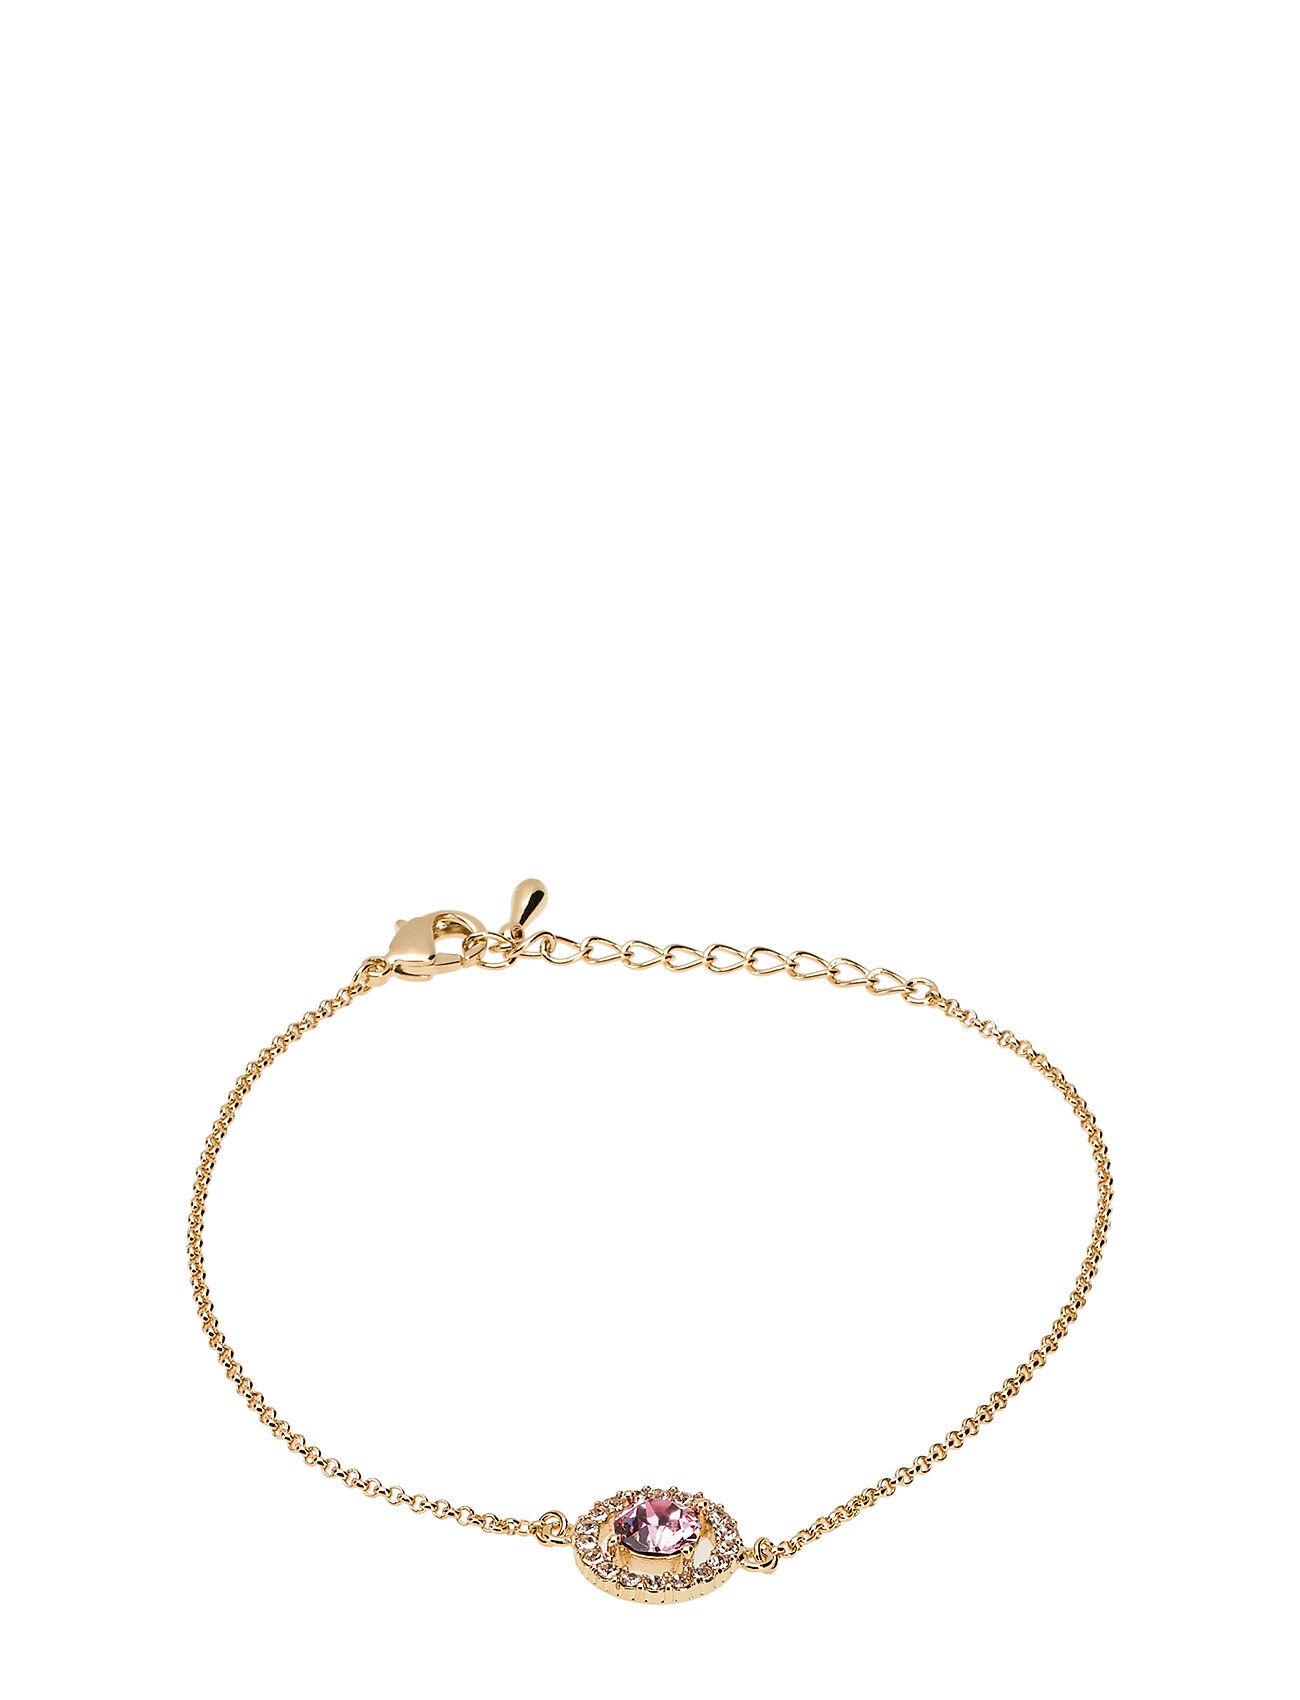 LILY AND ROSE Miss Miranda Bracelet - Light Rose Accessories Jewellery Bracelets Chain Bracelets Kulta LILY AND ROSE